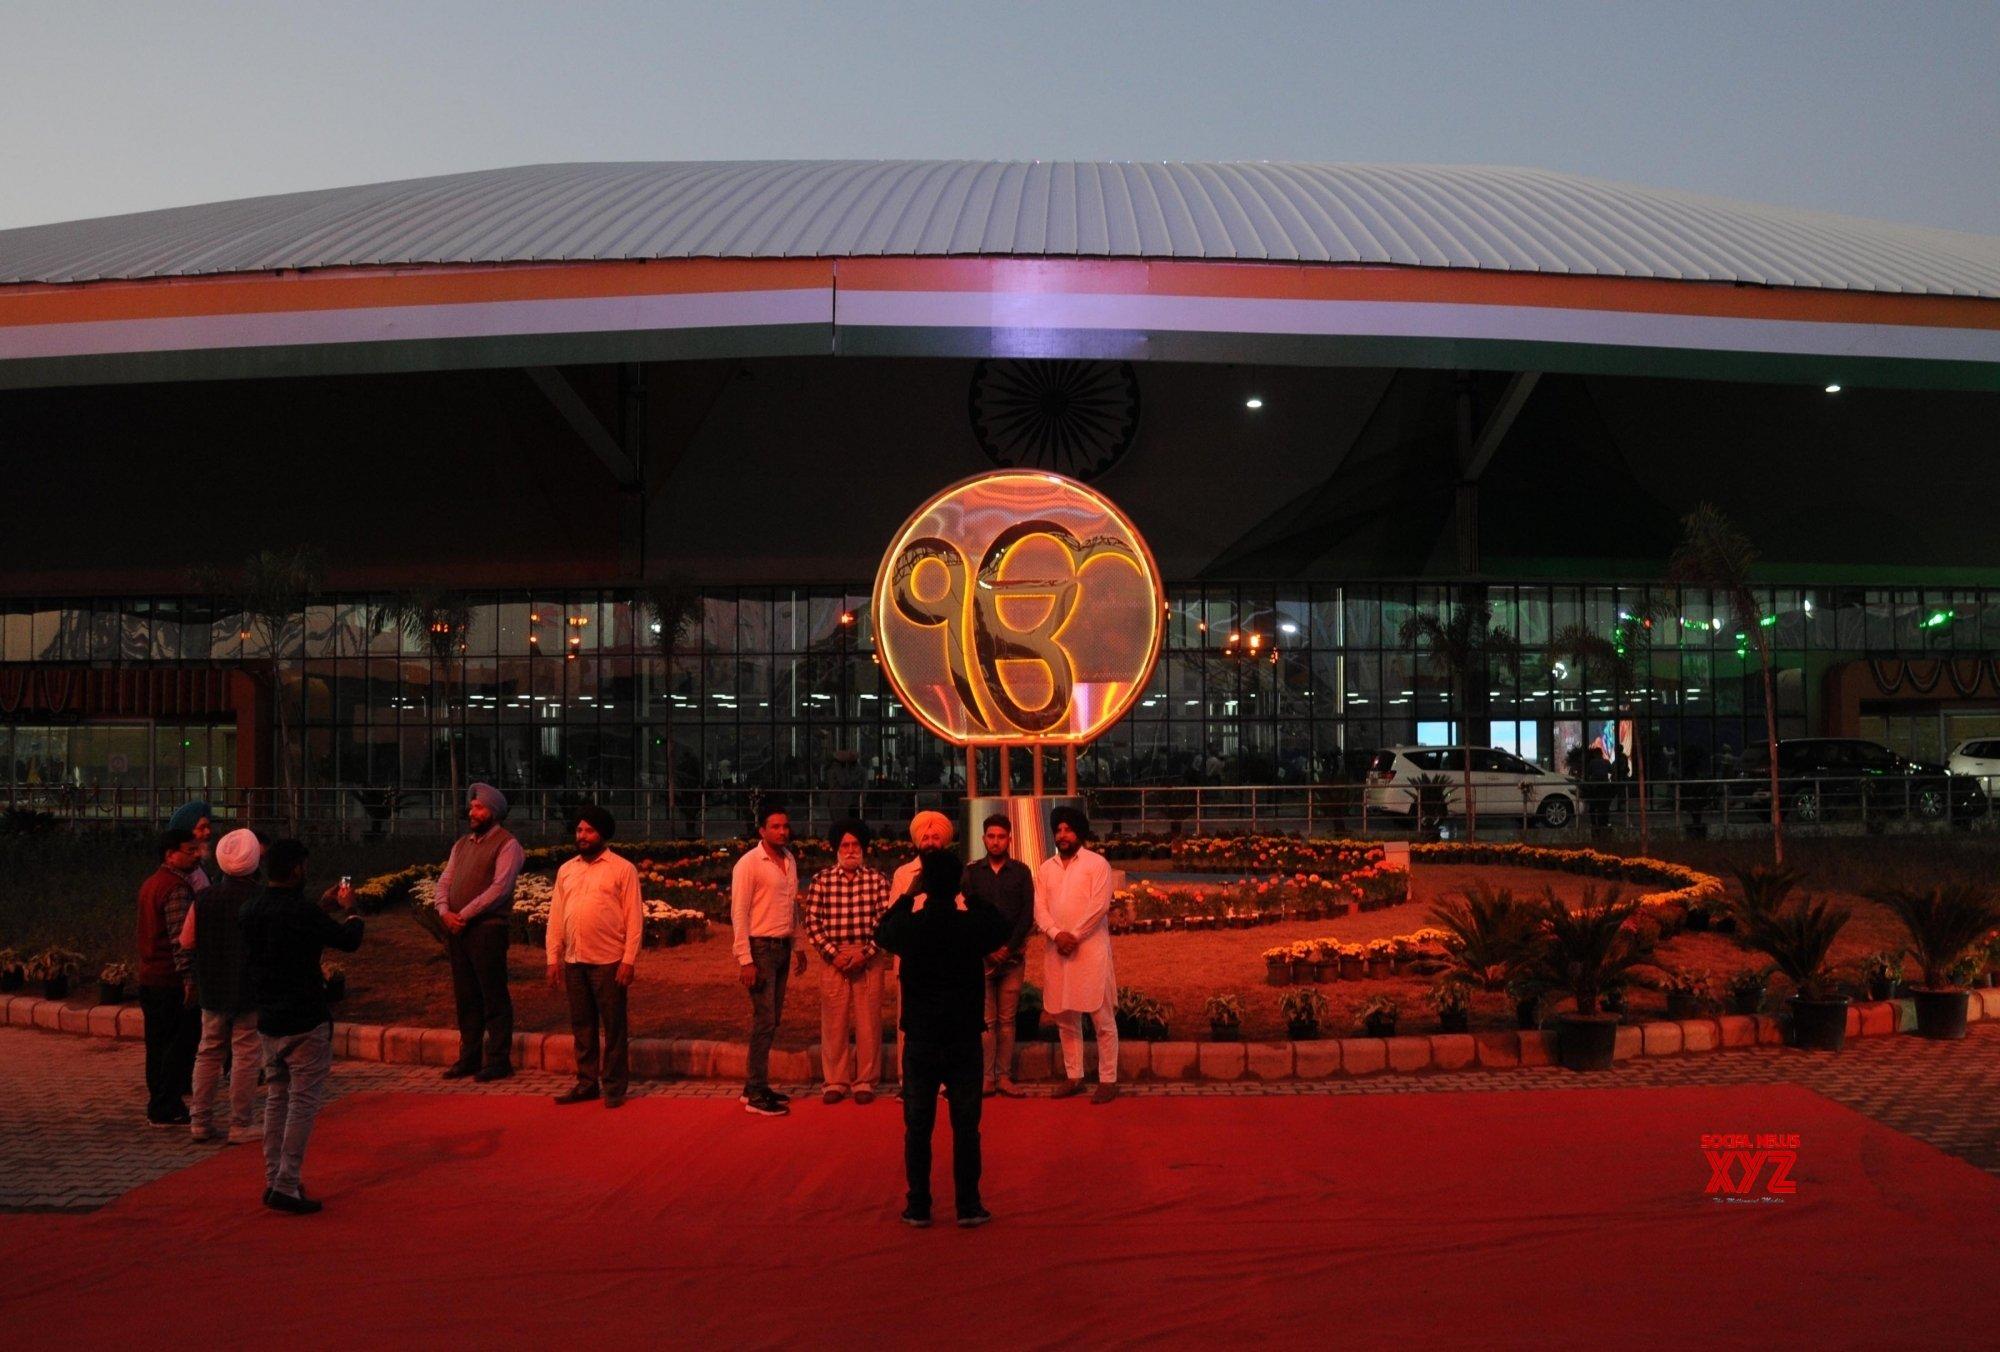 Gurdaspur: Indian pilgrims at newly inaugurated Integrated Check Post of Kartarpur Corridor in Punjab #Gallery